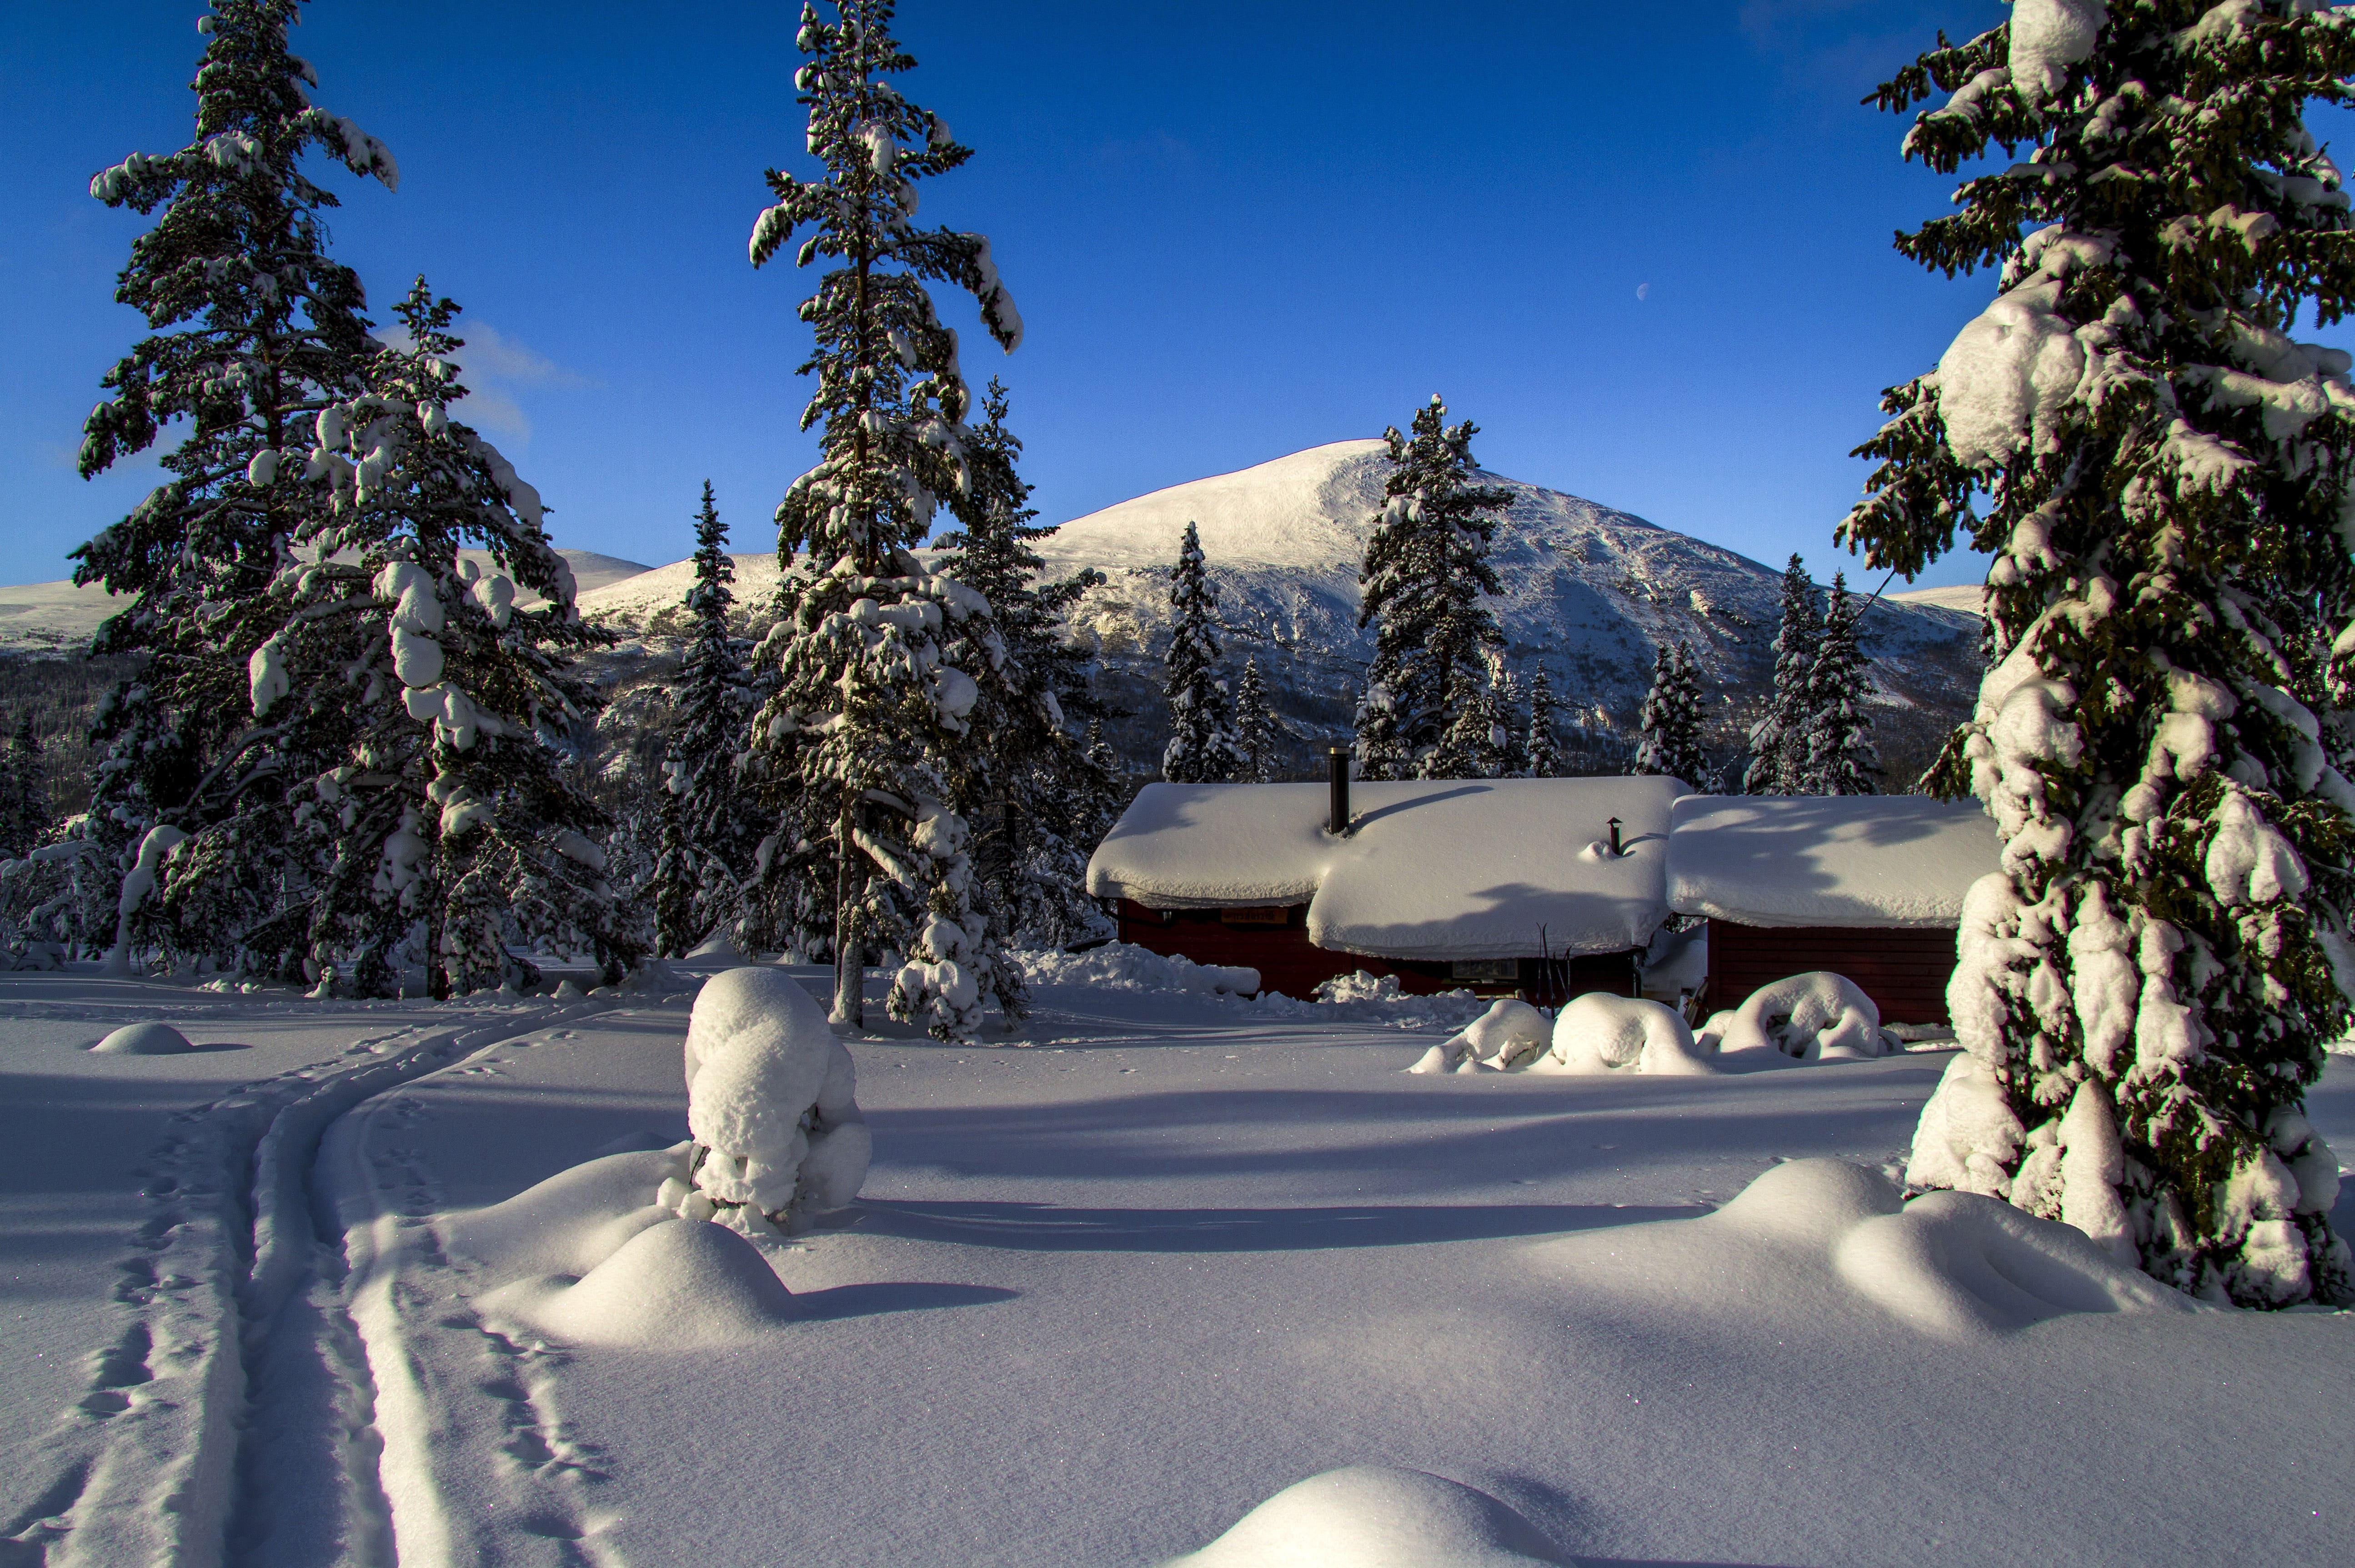 HDoboi.Kiev.ua - Лес среди гор покрытый снегом зимой